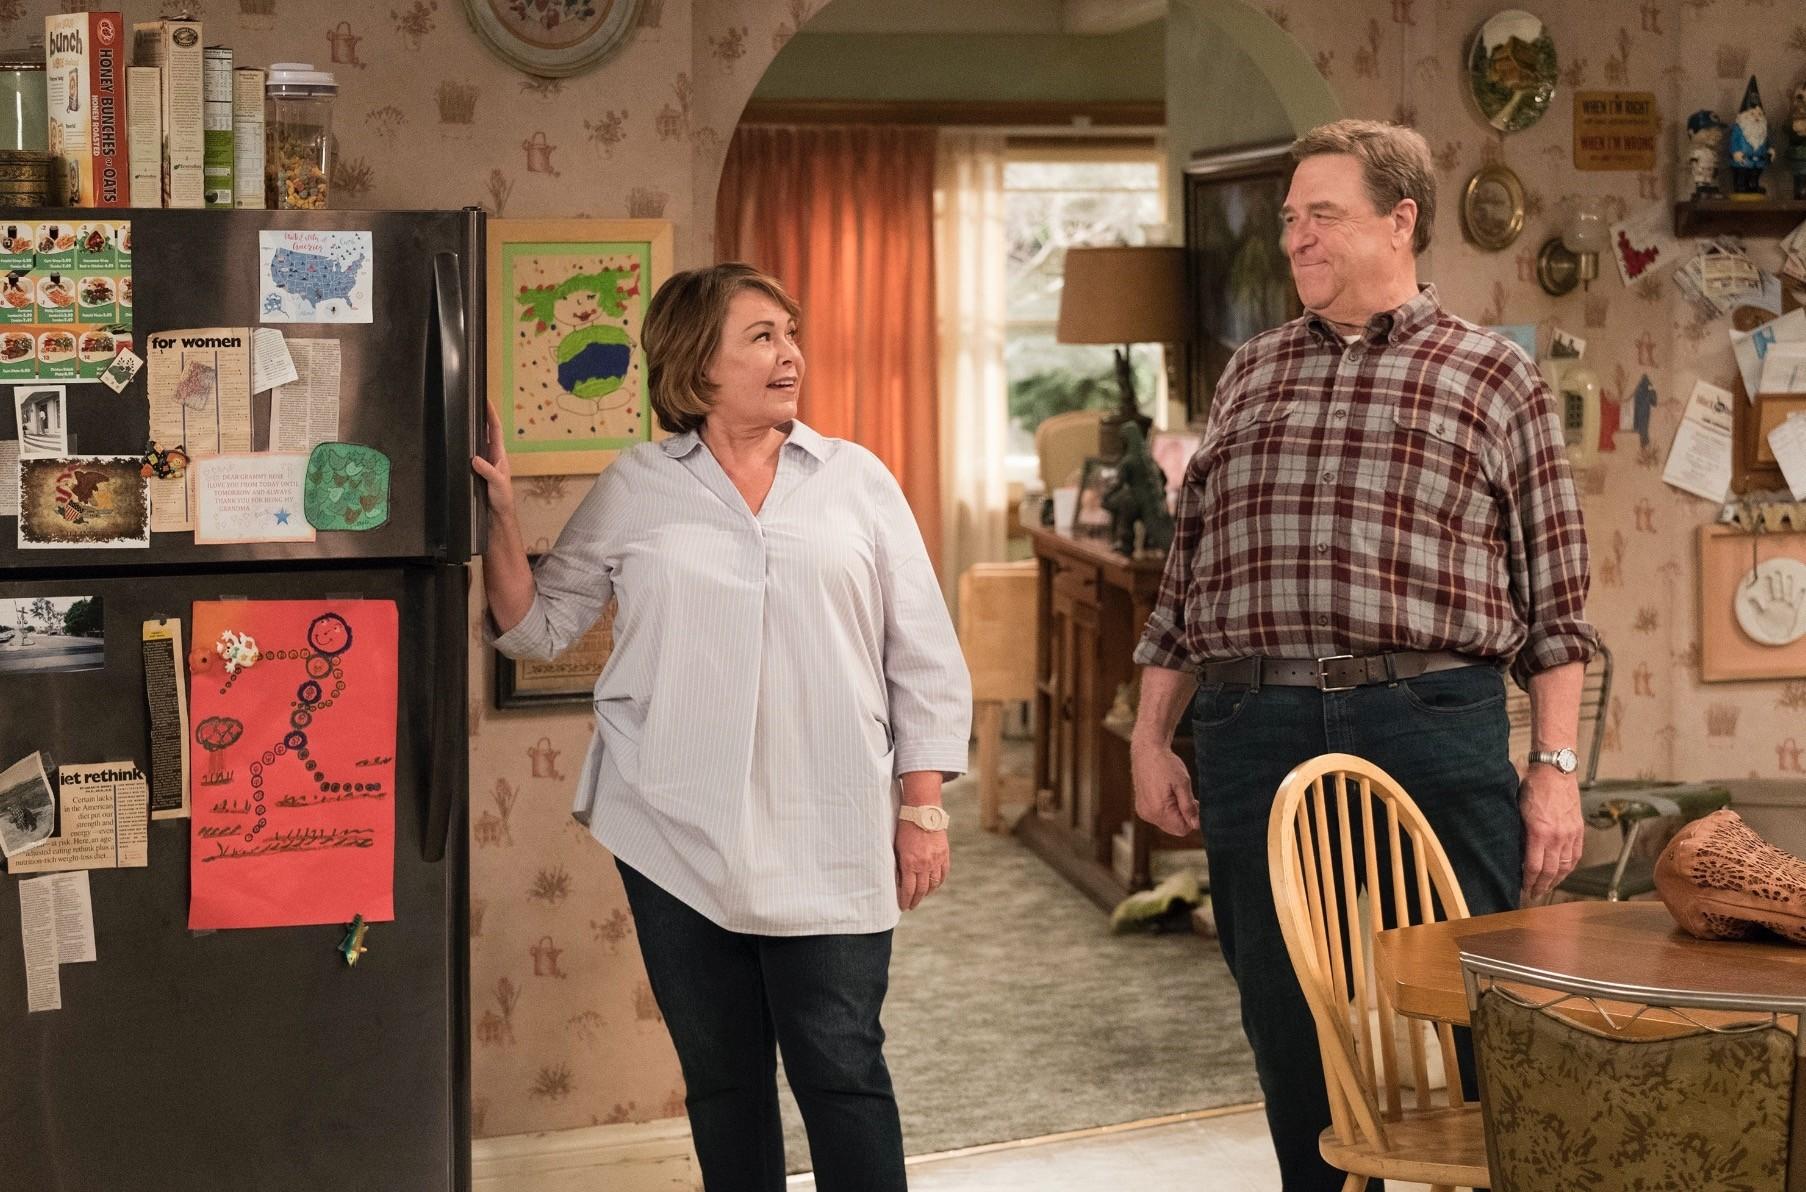 Roseanne Barr (L) and John Goodman appear in a scene from u201cRoseanne.u201d The show was canceled after Barru2019s racist tweet.